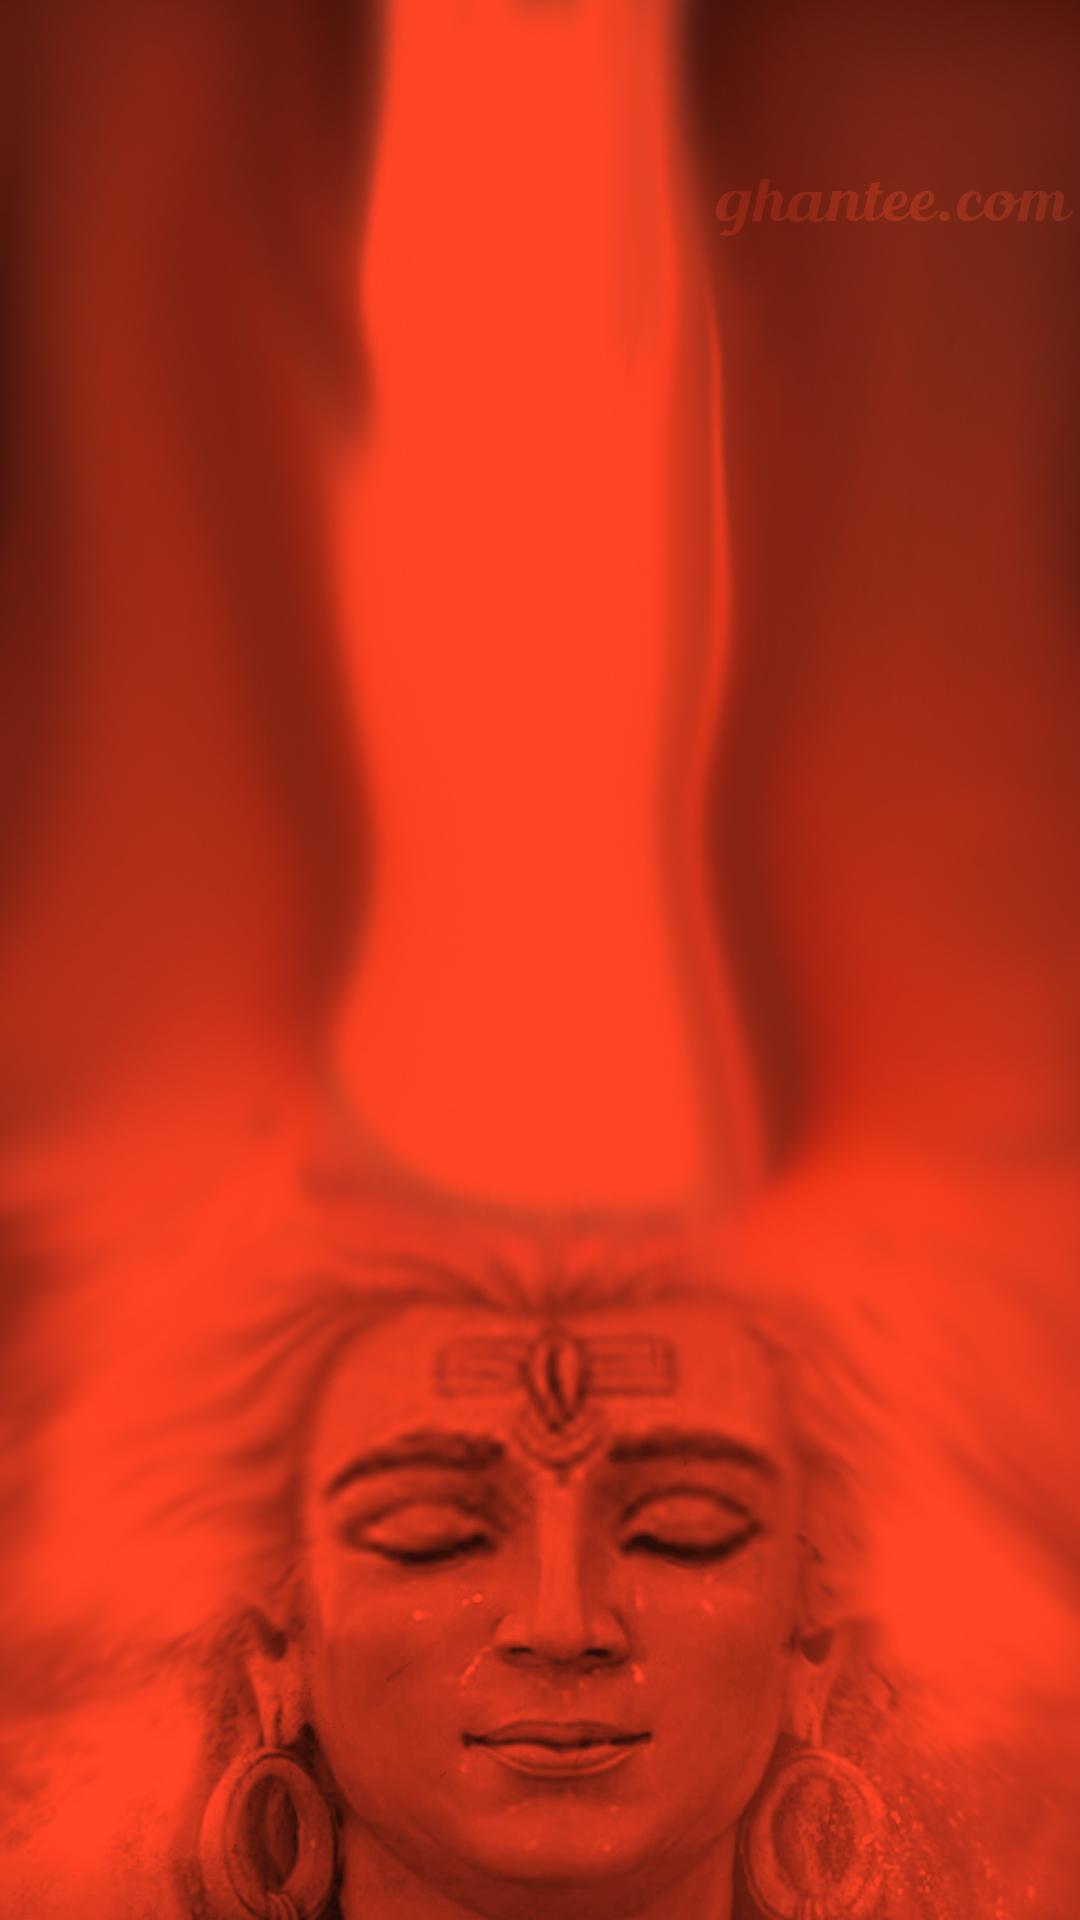 orange lord shiva phone wallpaper